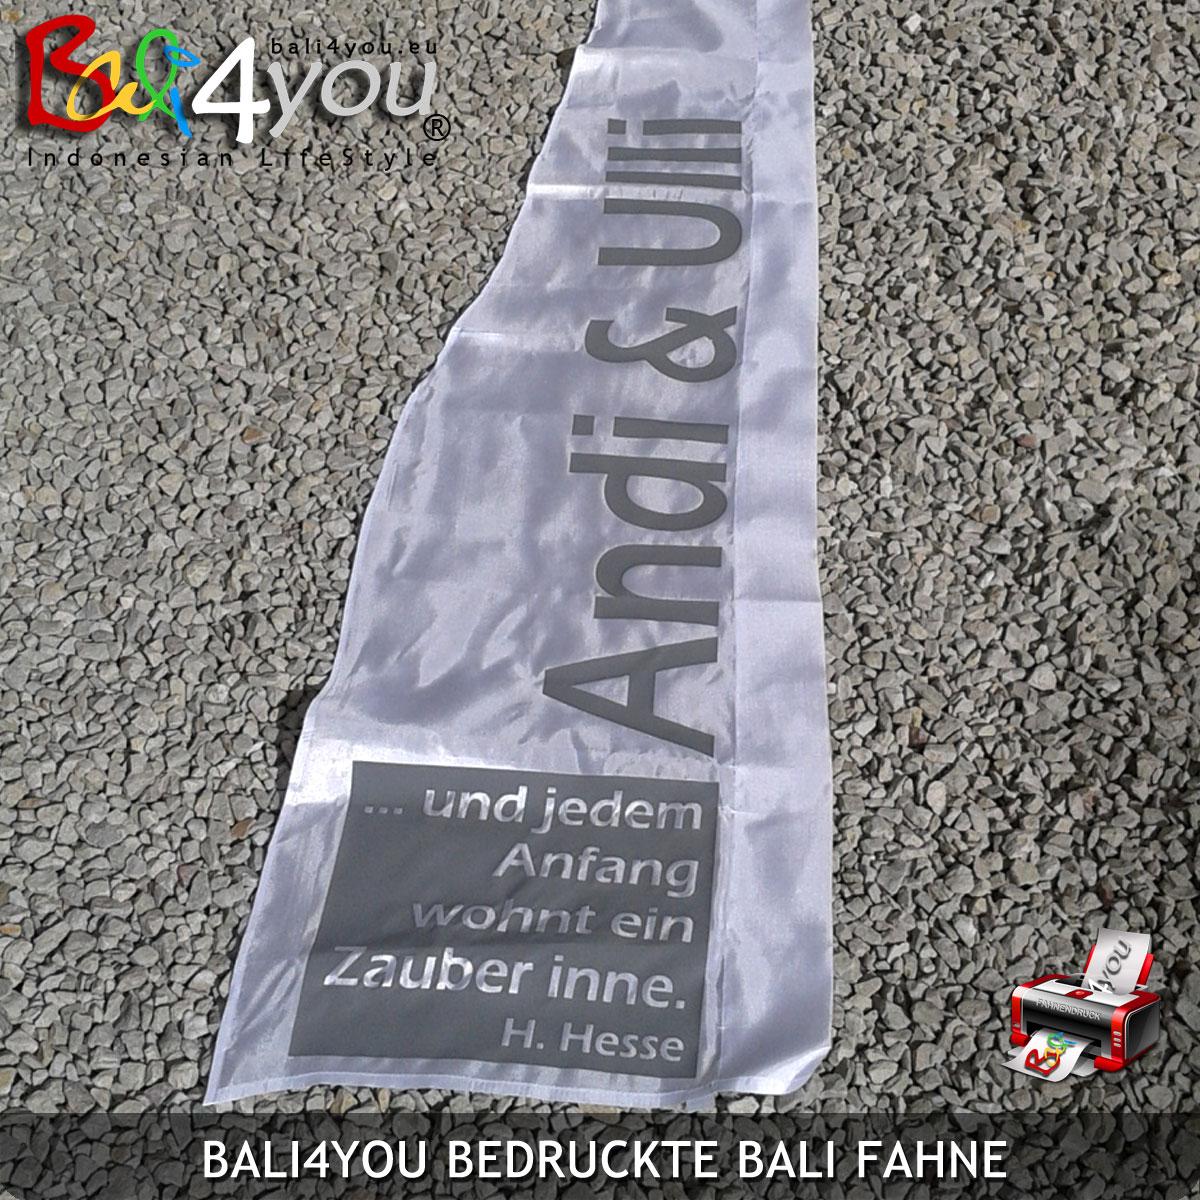 Balifahne_Bali4you_hochzeitsfahne